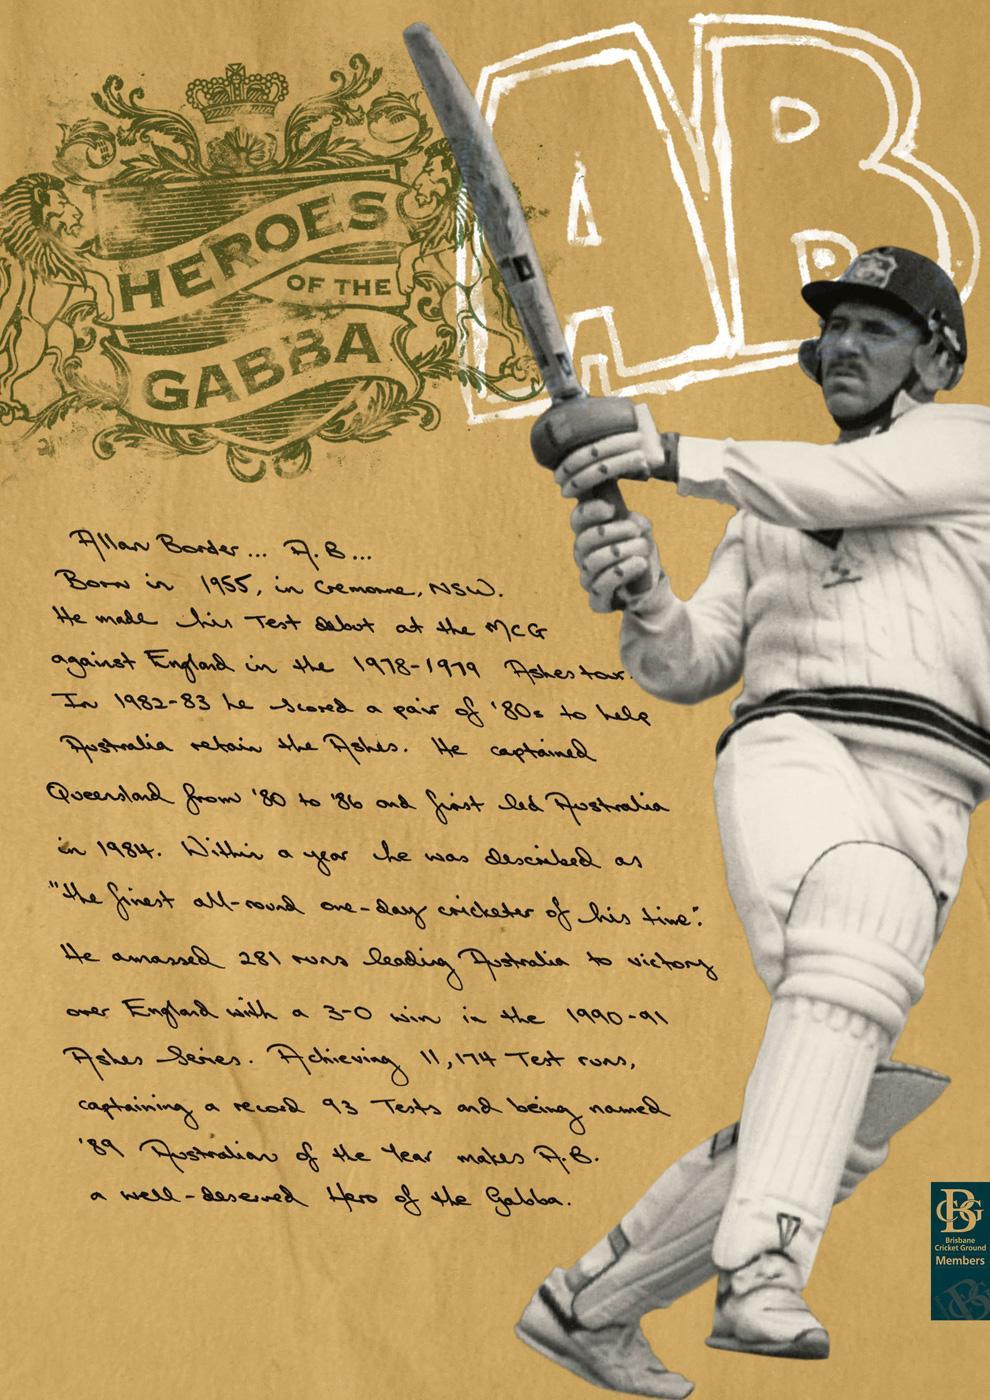 Brisbane Cricket Ground Print Ad -  Heroes of the Gabba, 1